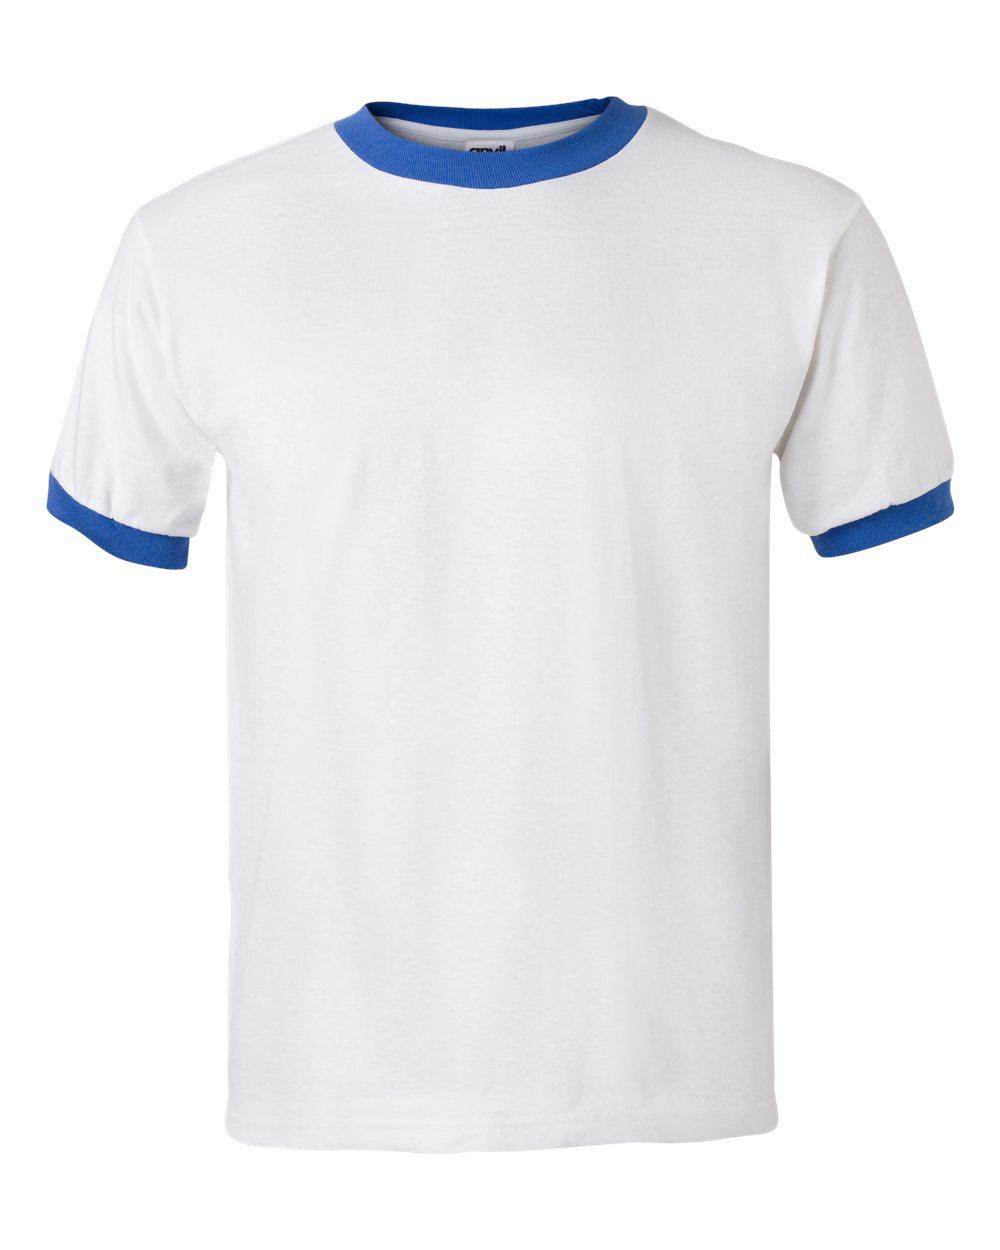 Anvil T Shirts Custom Rockwall Auction